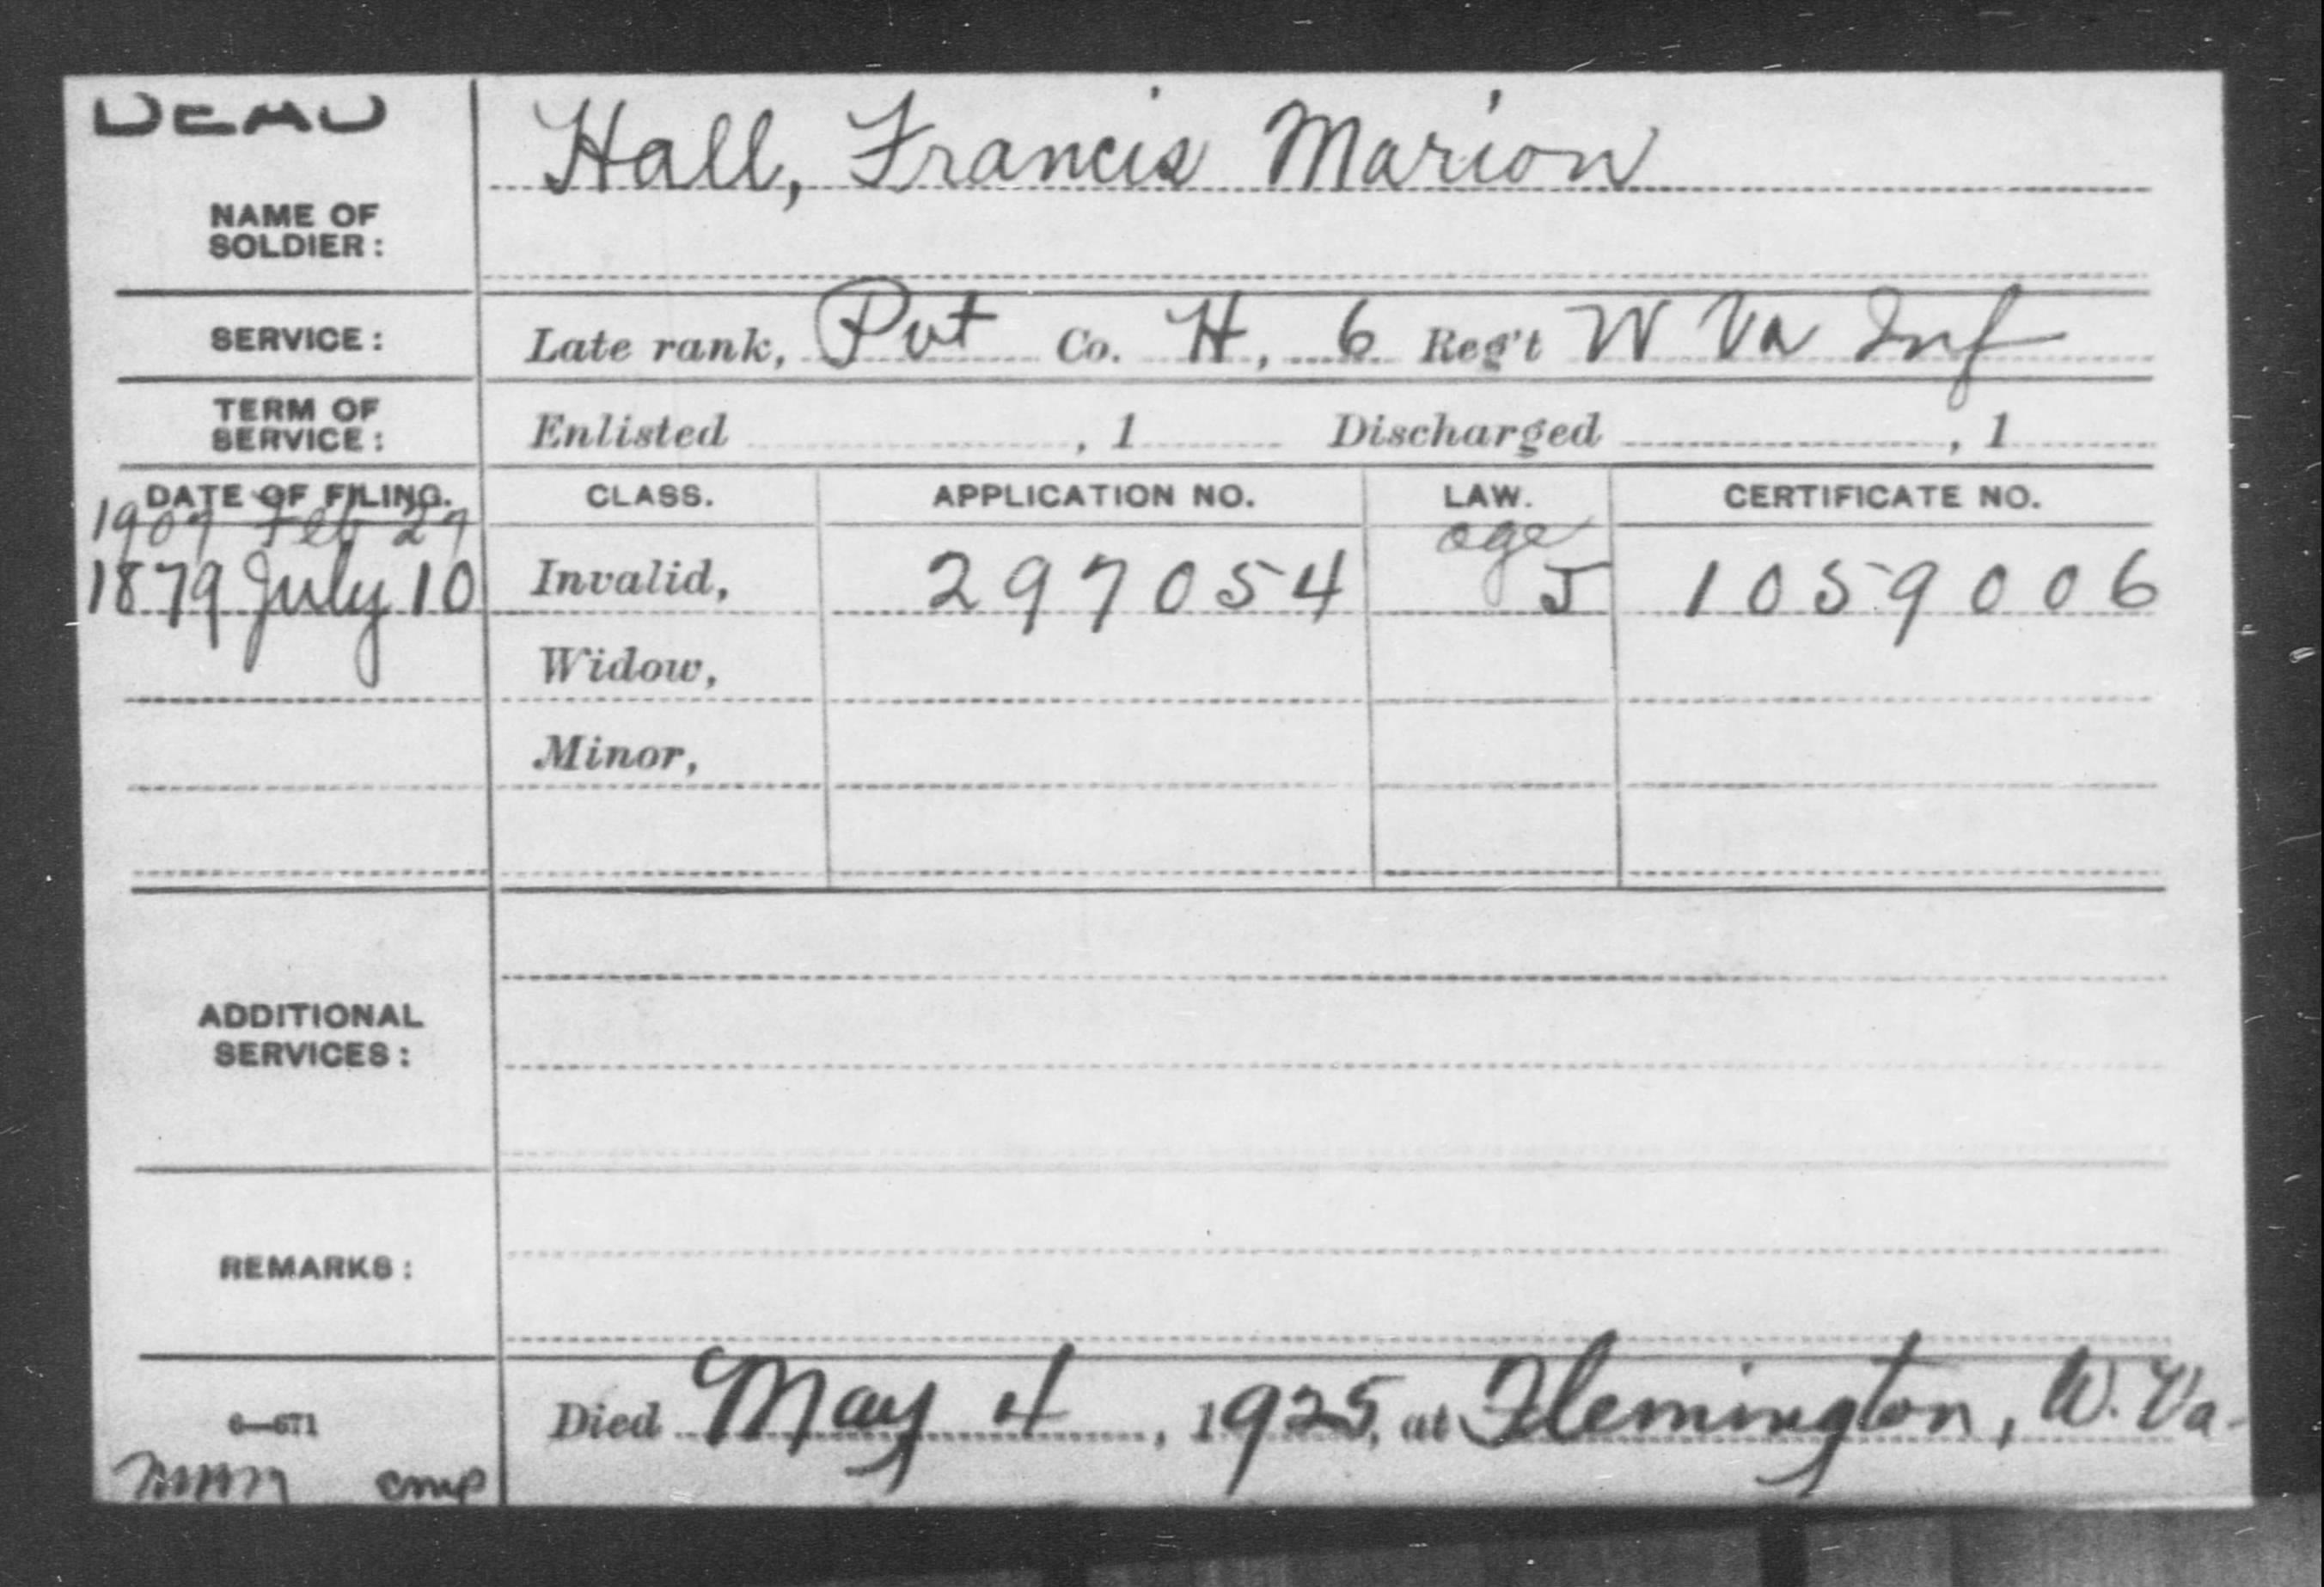 Francis Marion Hall